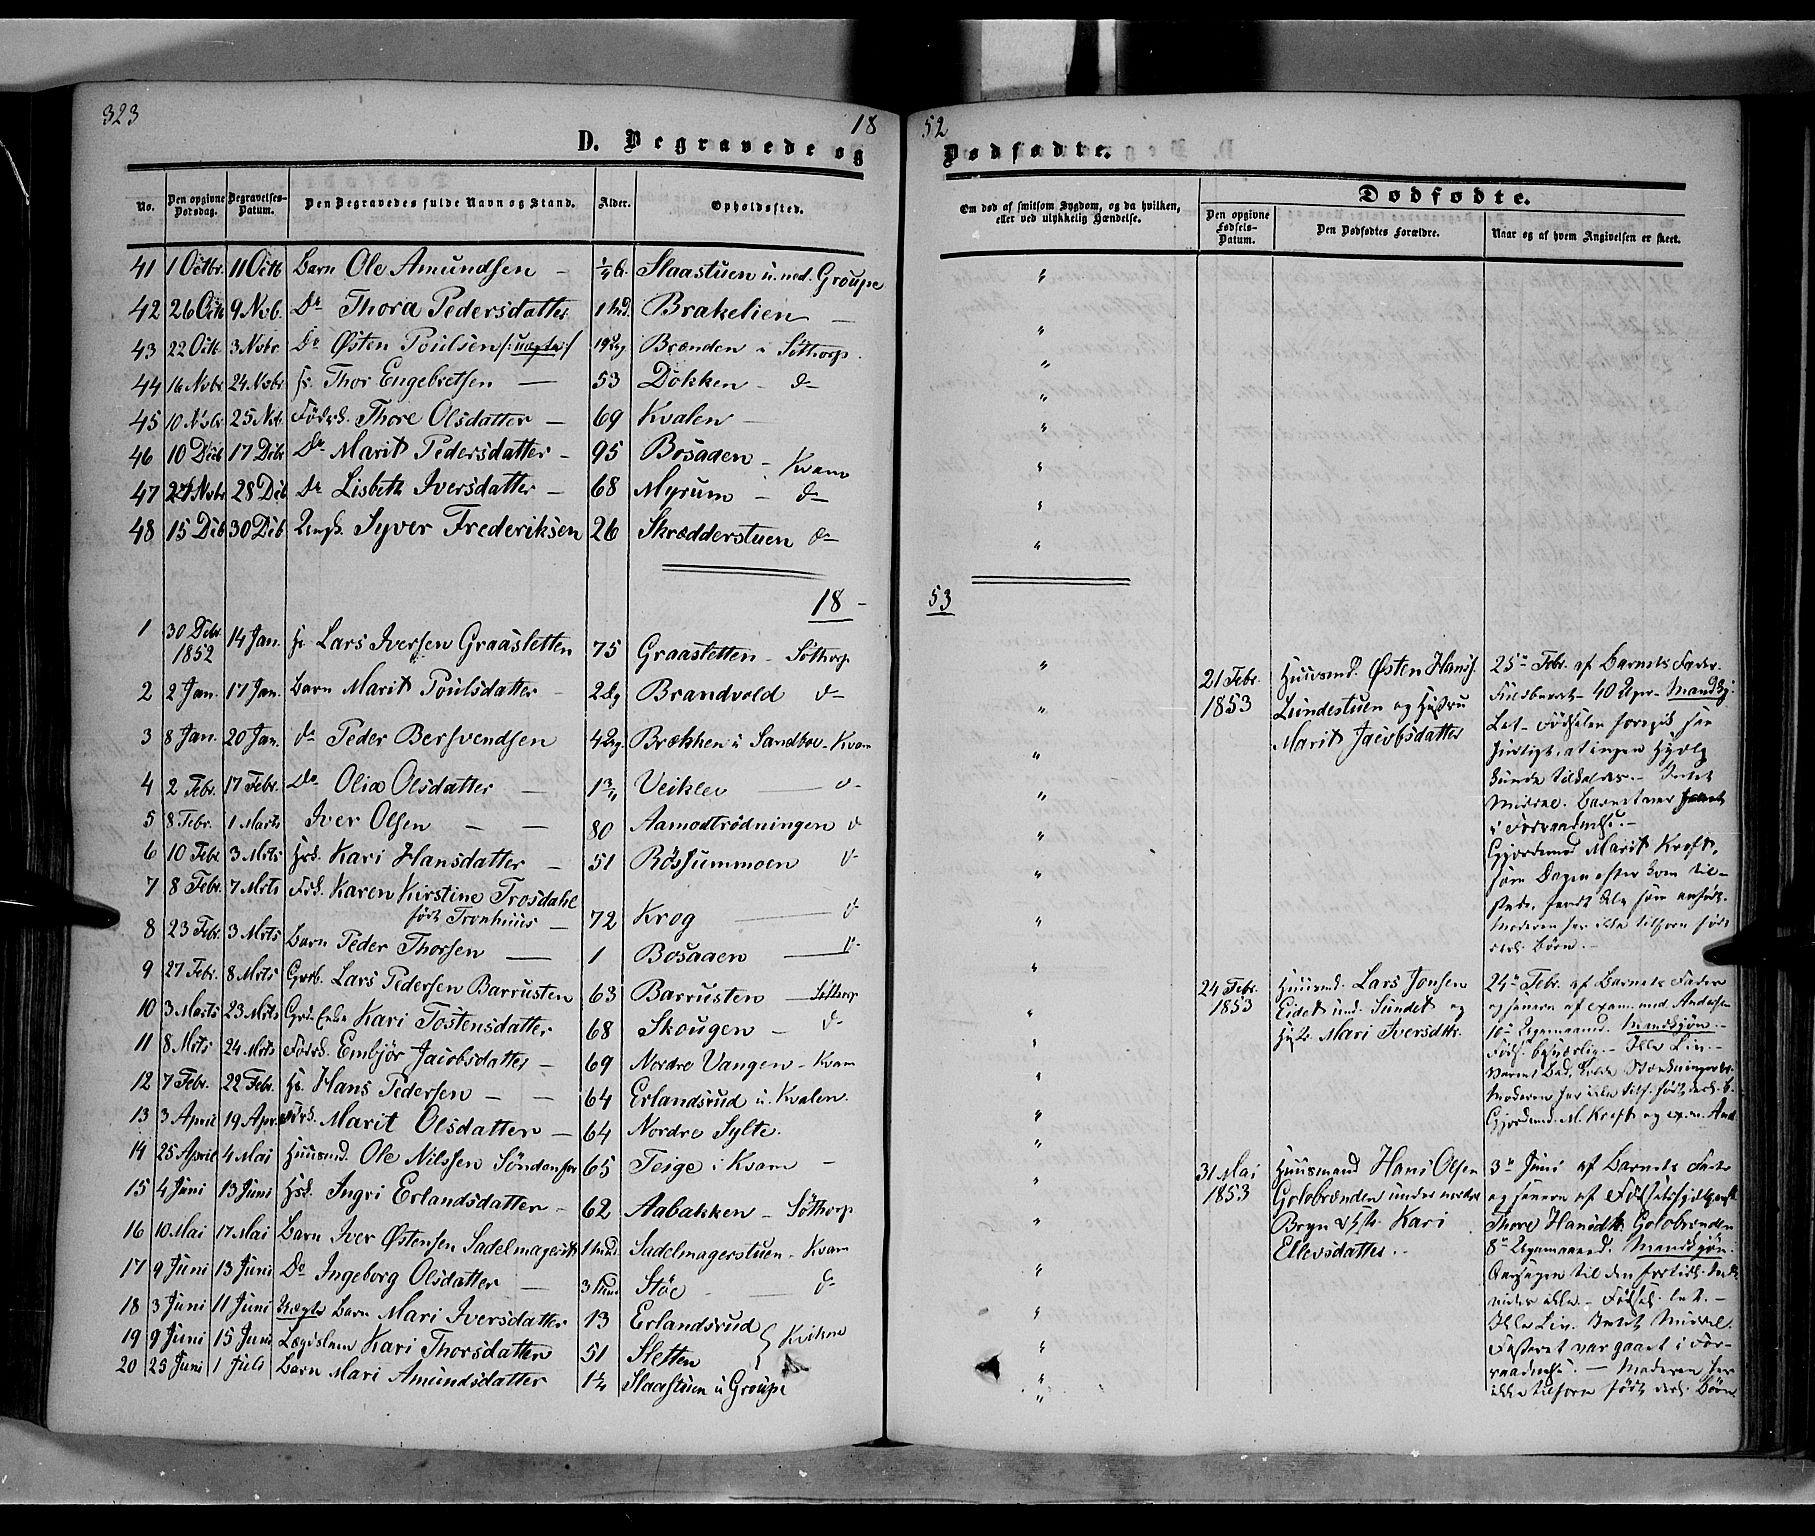 SAH, Nord-Fron prestekontor, Ministerialbok nr. 1, 1851-1864, s. 323